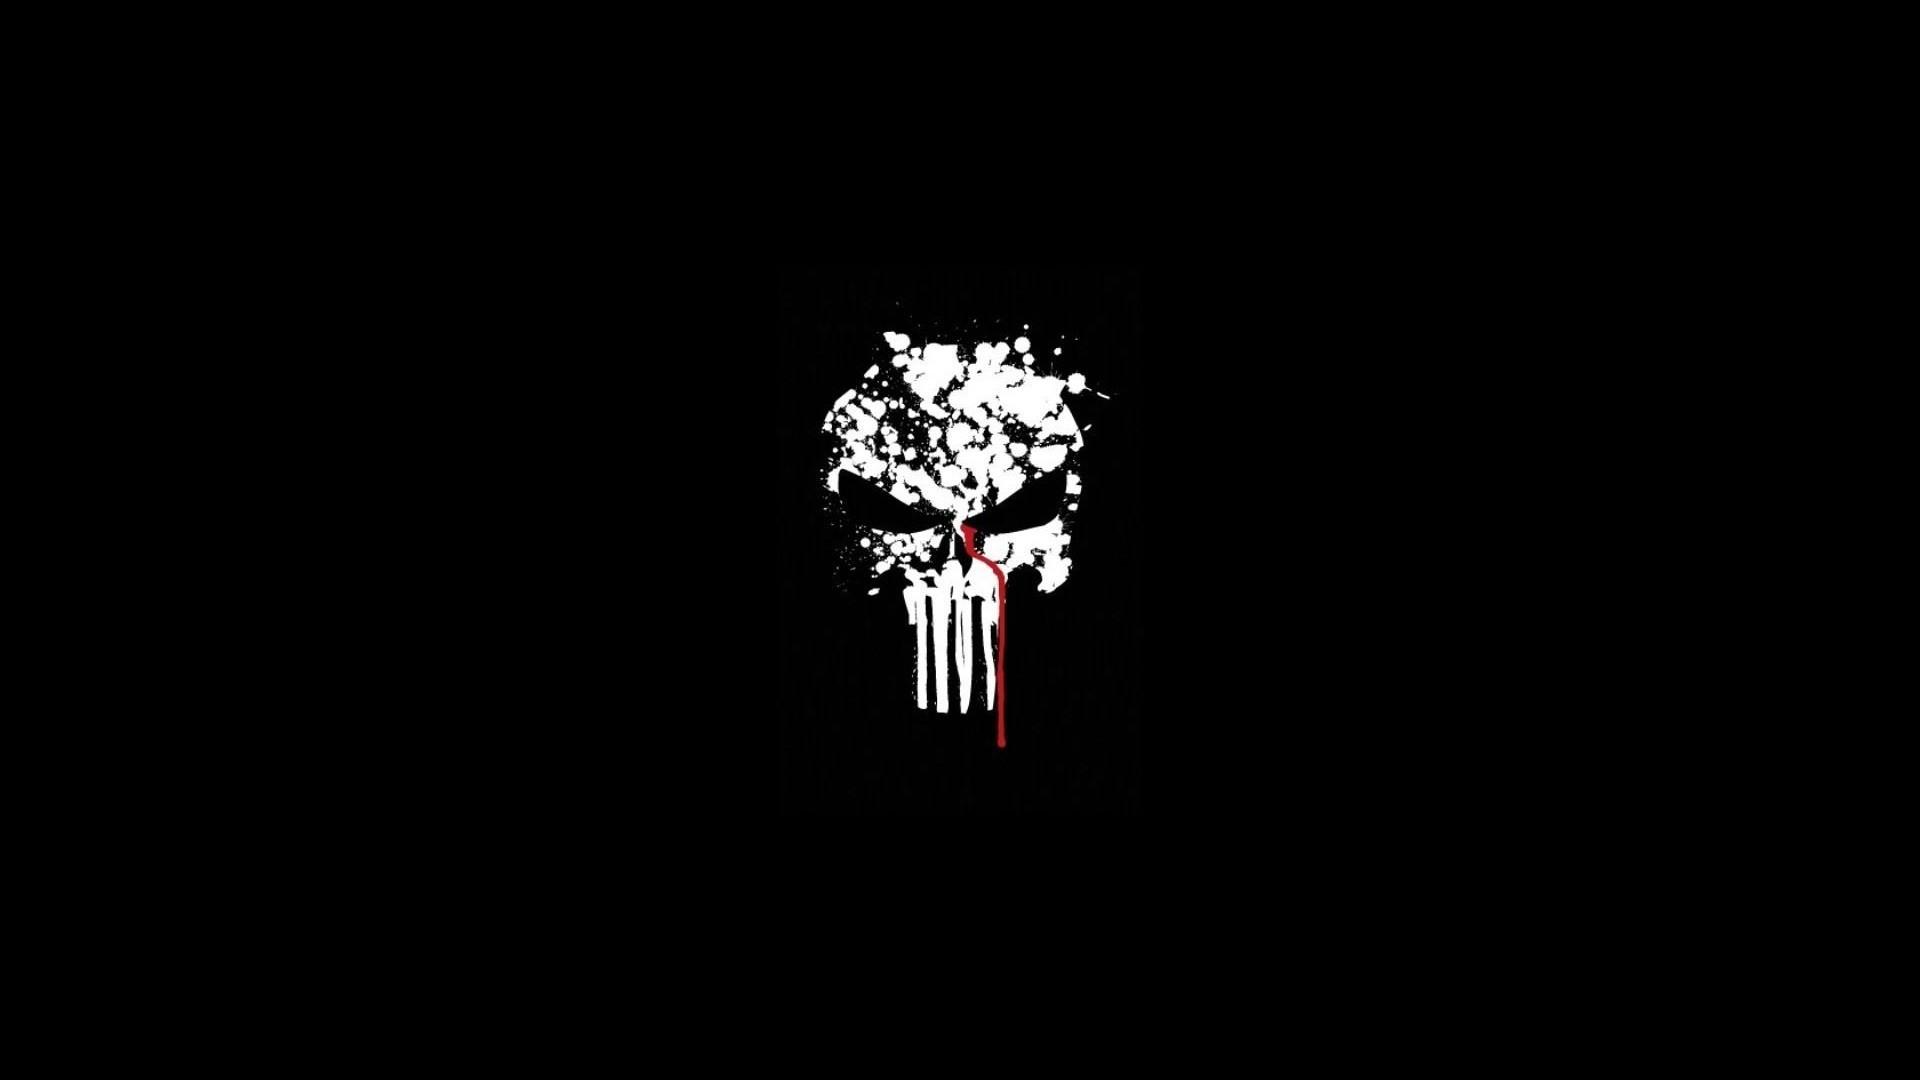 Punisher Skull Images | Crazy Gallery